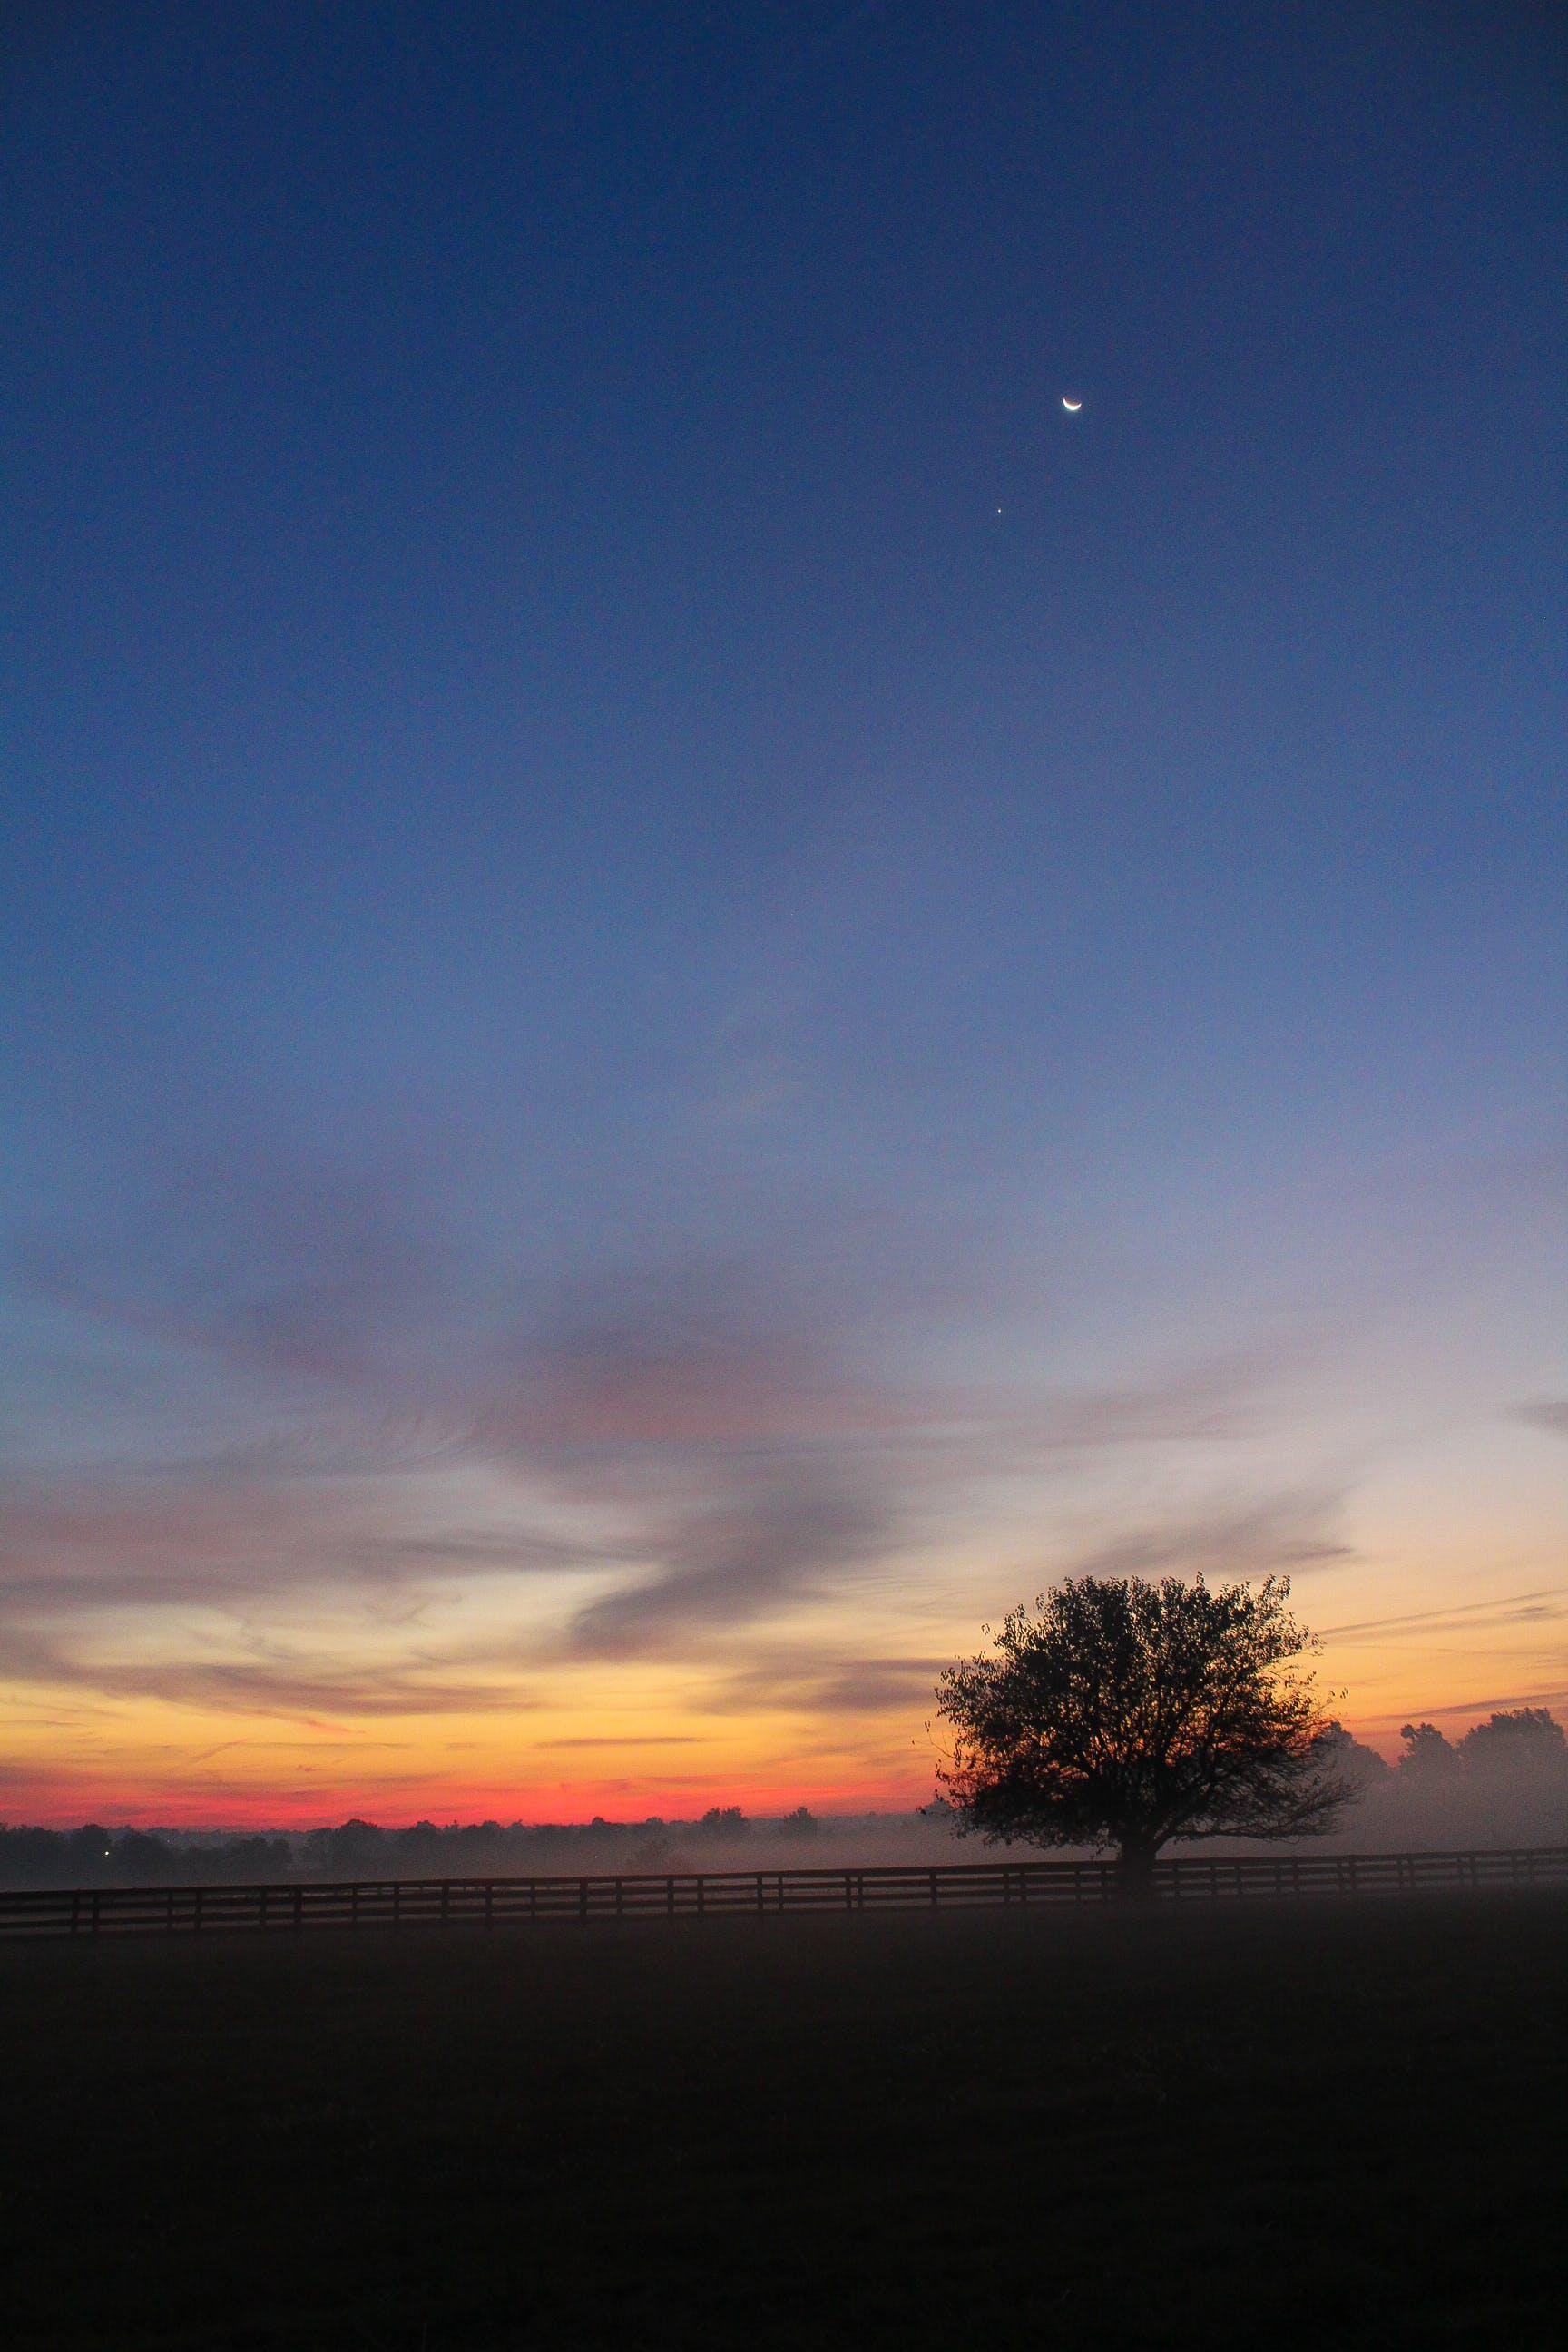 Kostenloses Stock Foto zu abend, baum, himmel, sonnenuntergang